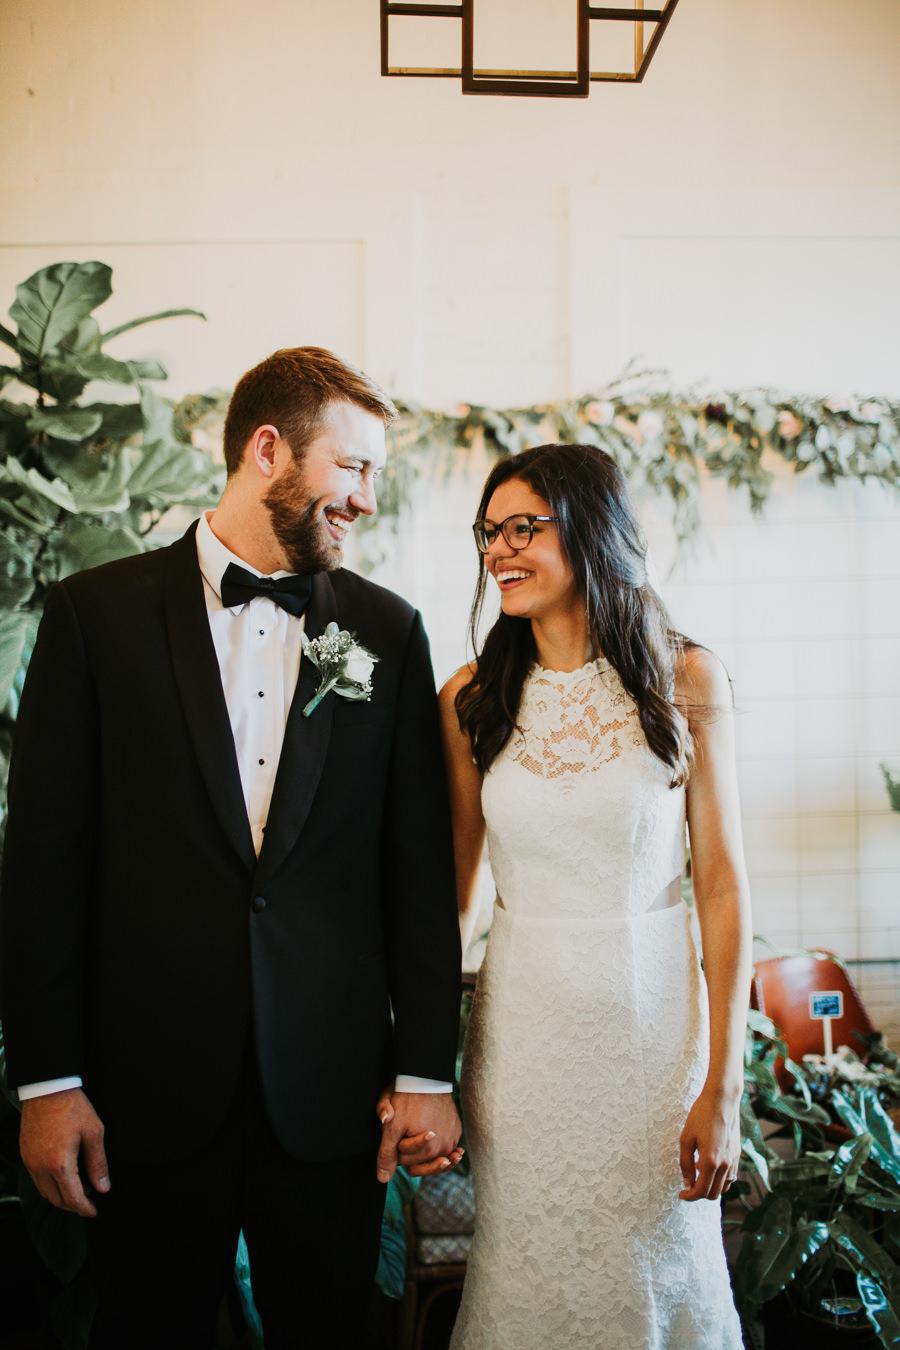 Tampa Heights Industrial Wedding at Cavu Emmy RJ-172.jpg